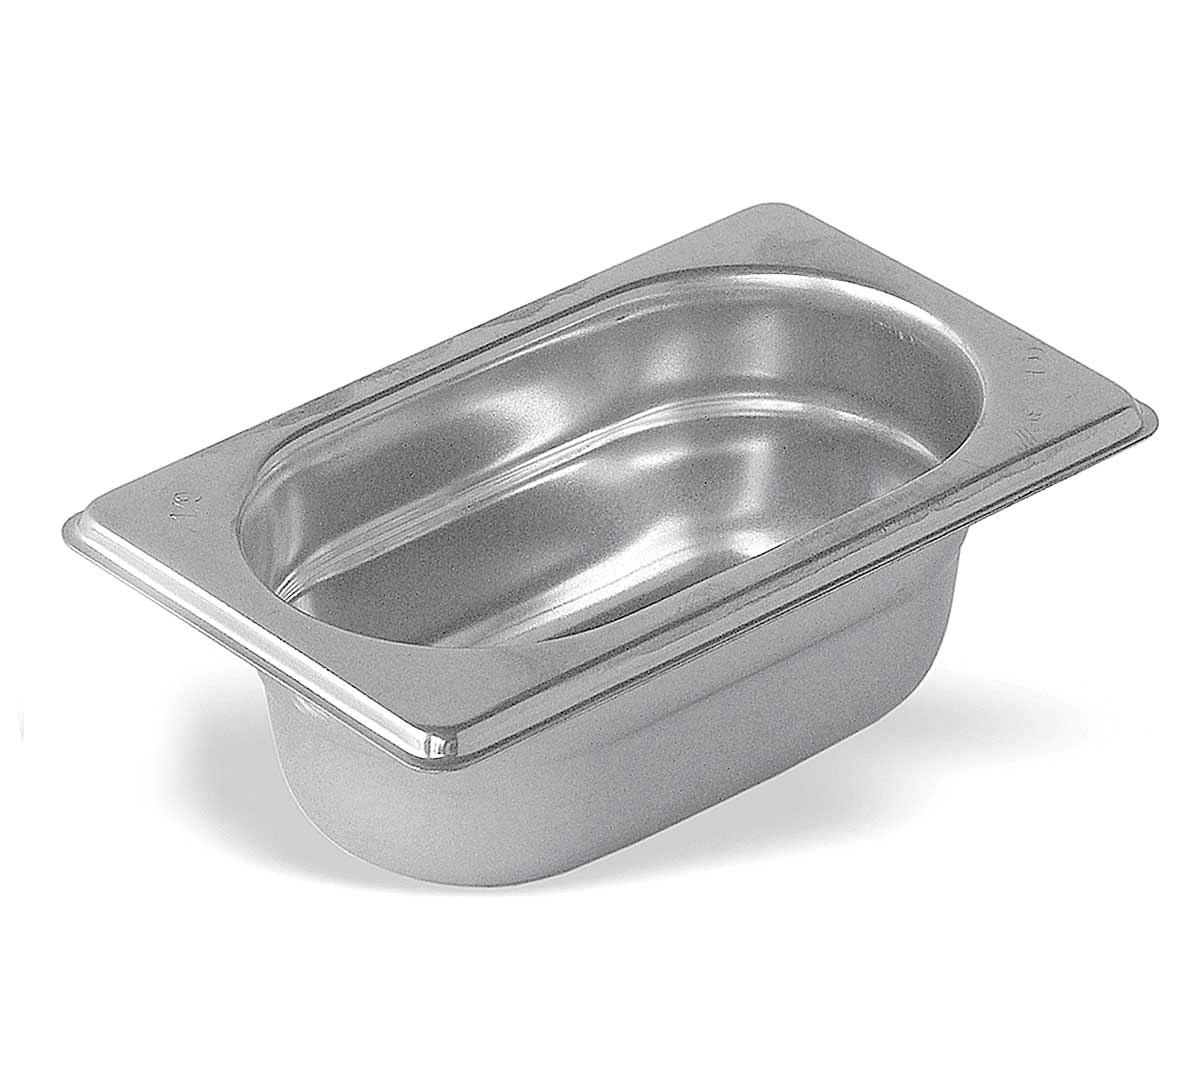 Cubeta Gastronorm 176x108 mm